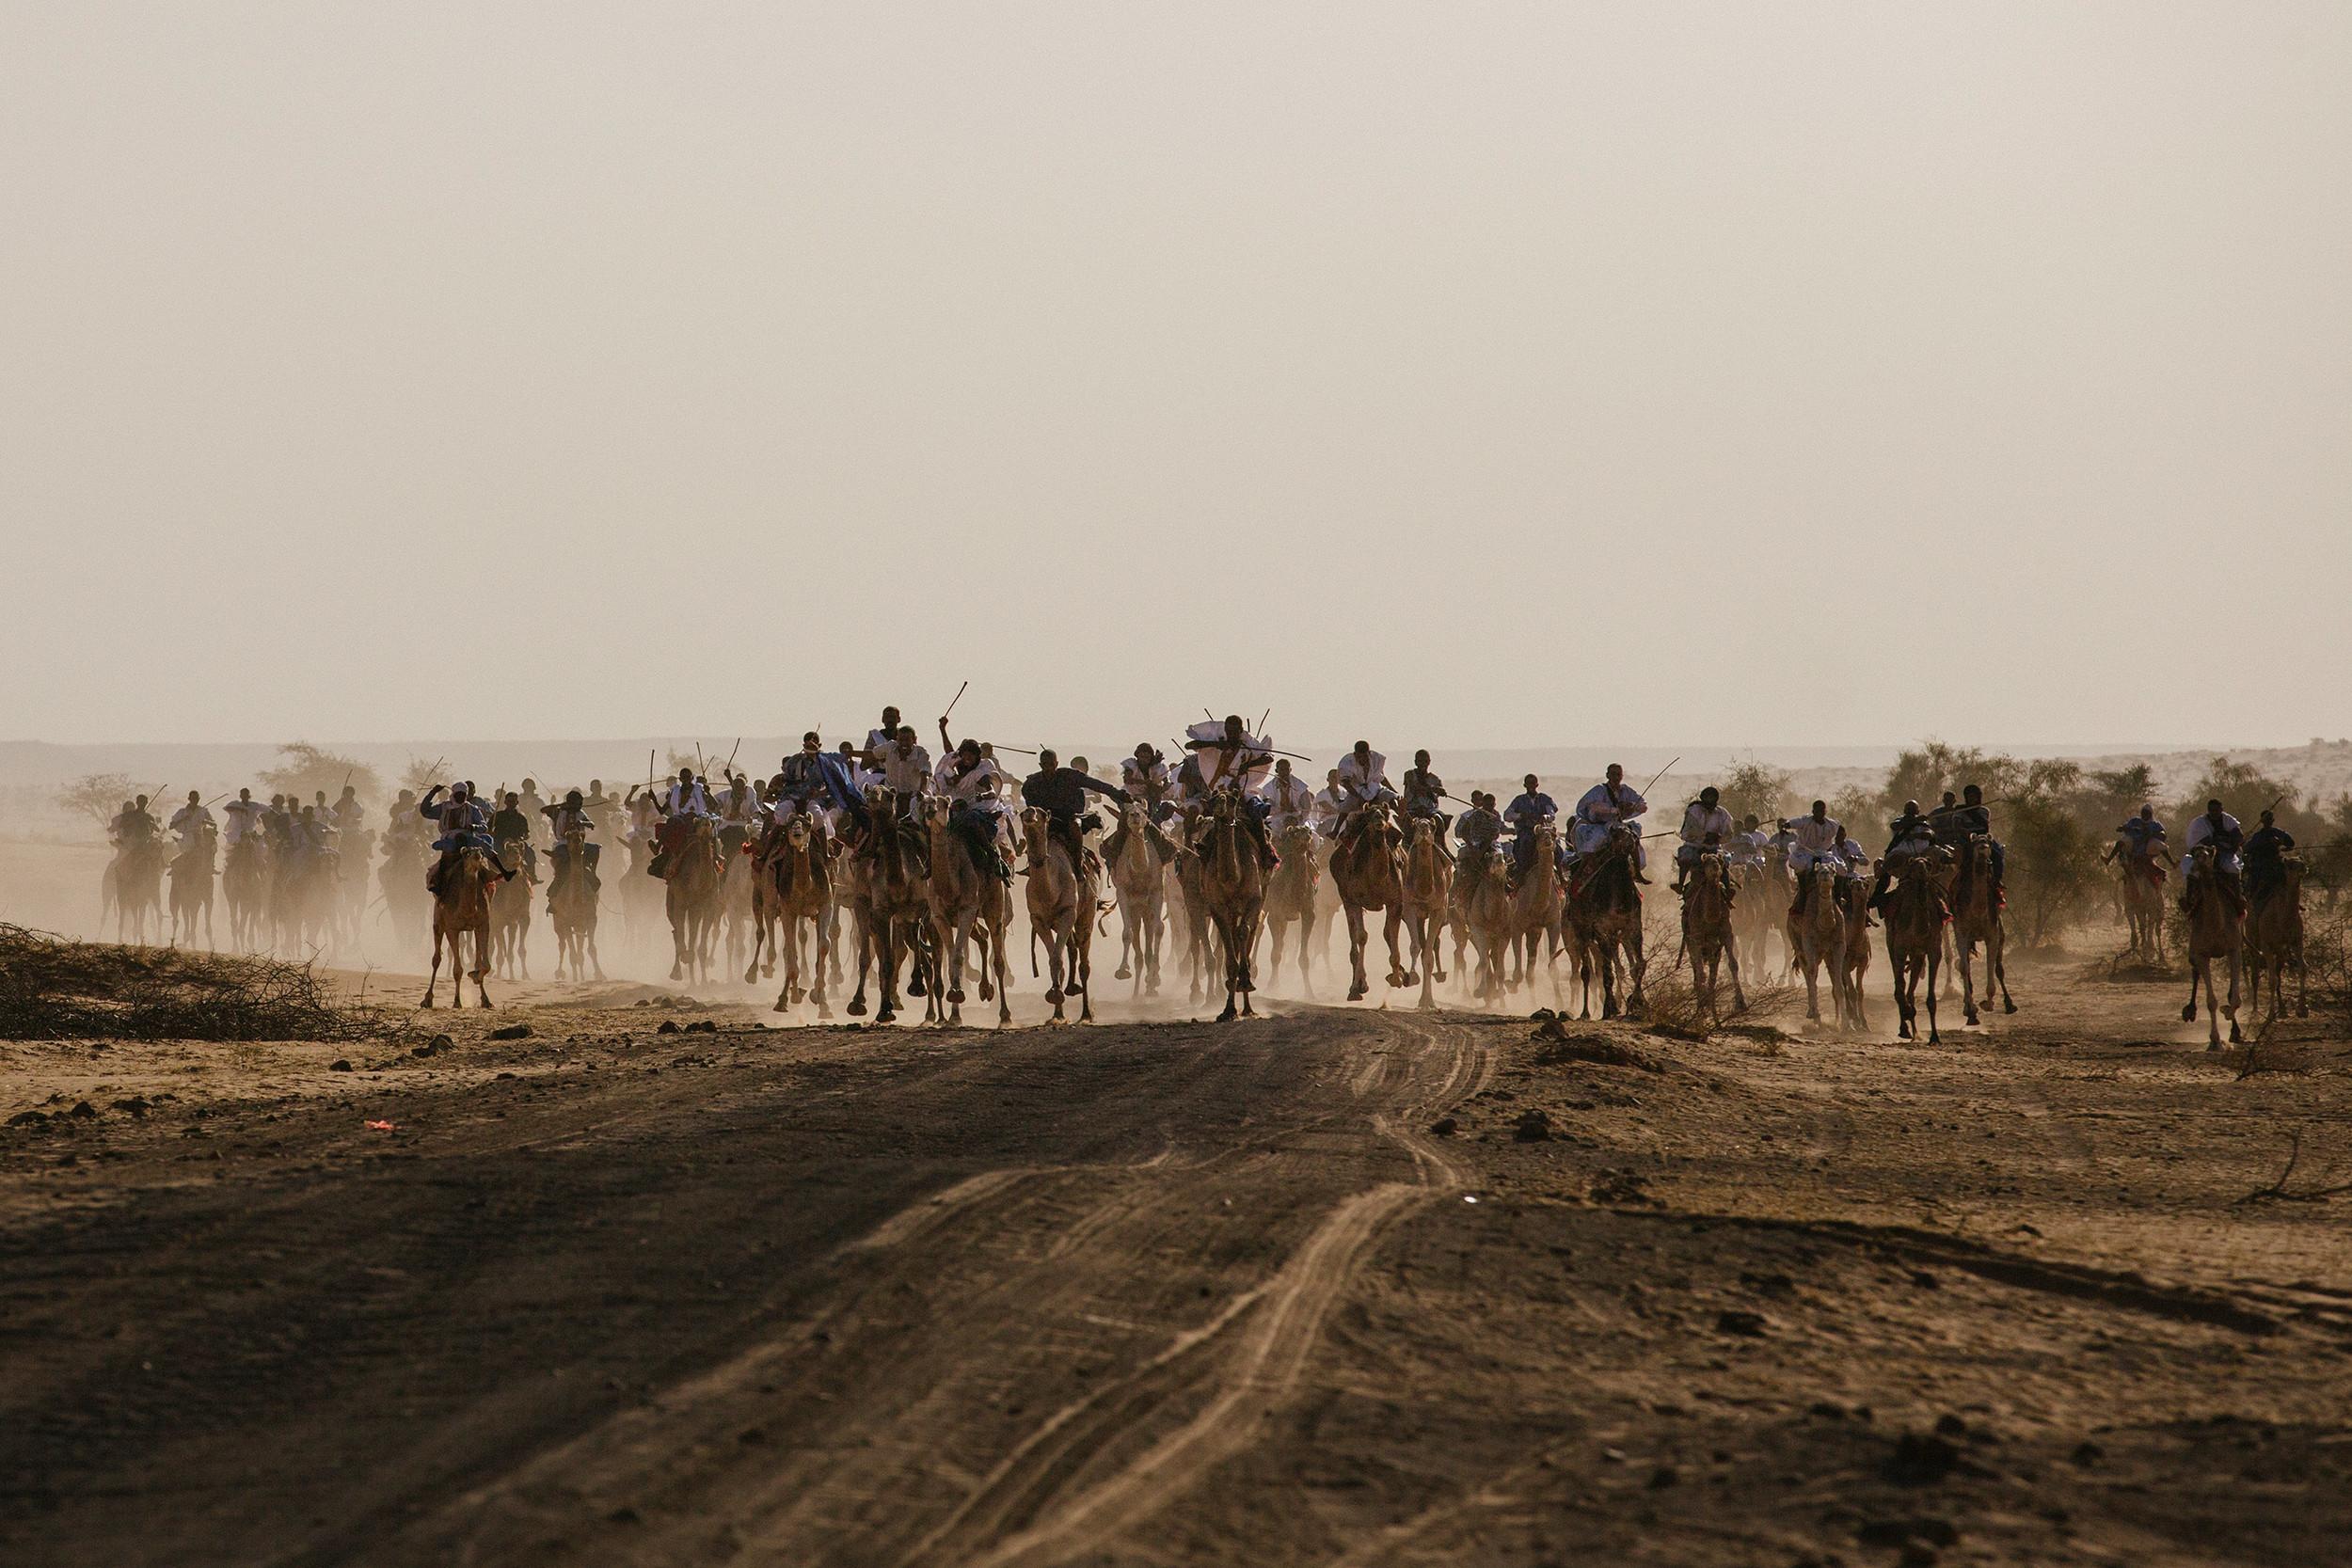 Camel race begins